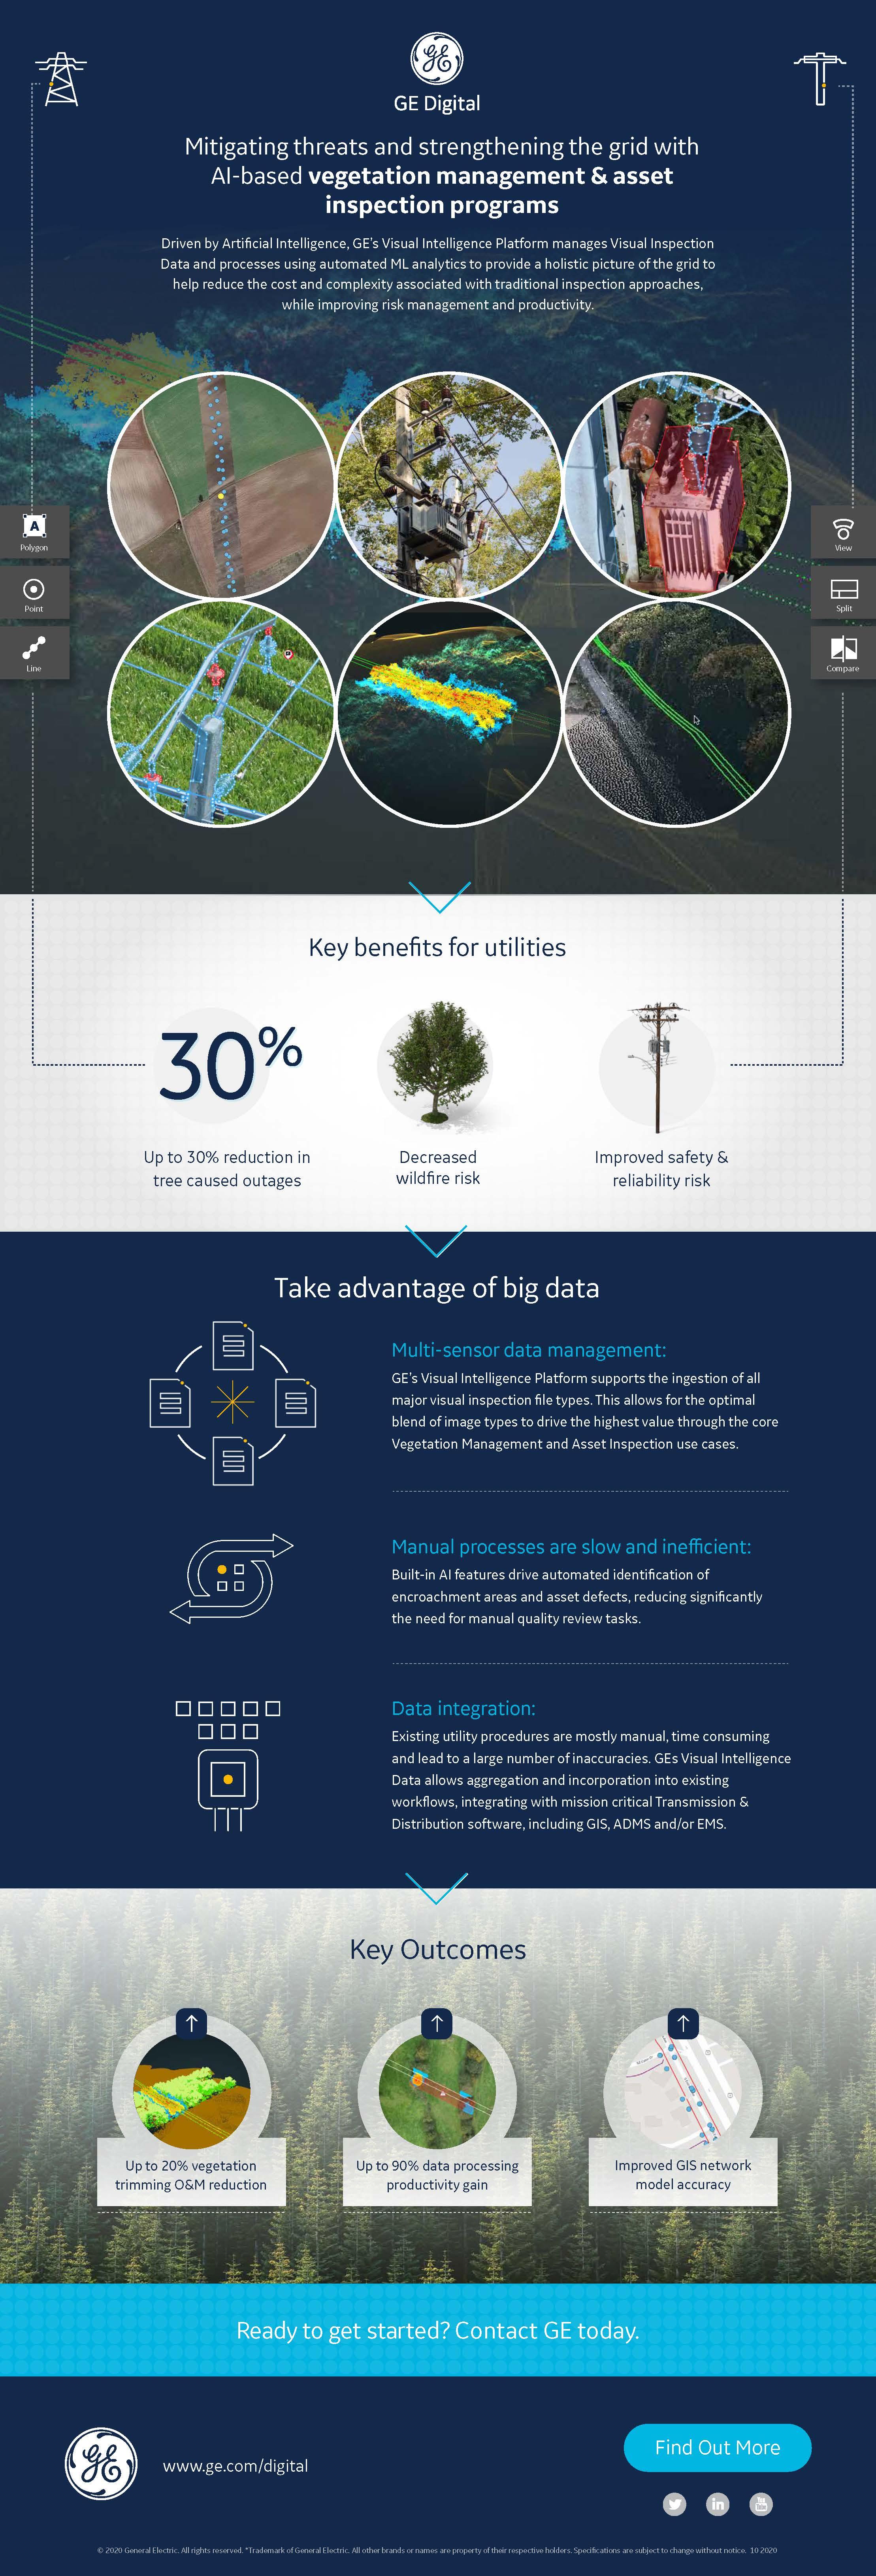 Visual Intelligence for vegetation management for utilities   GE Digital